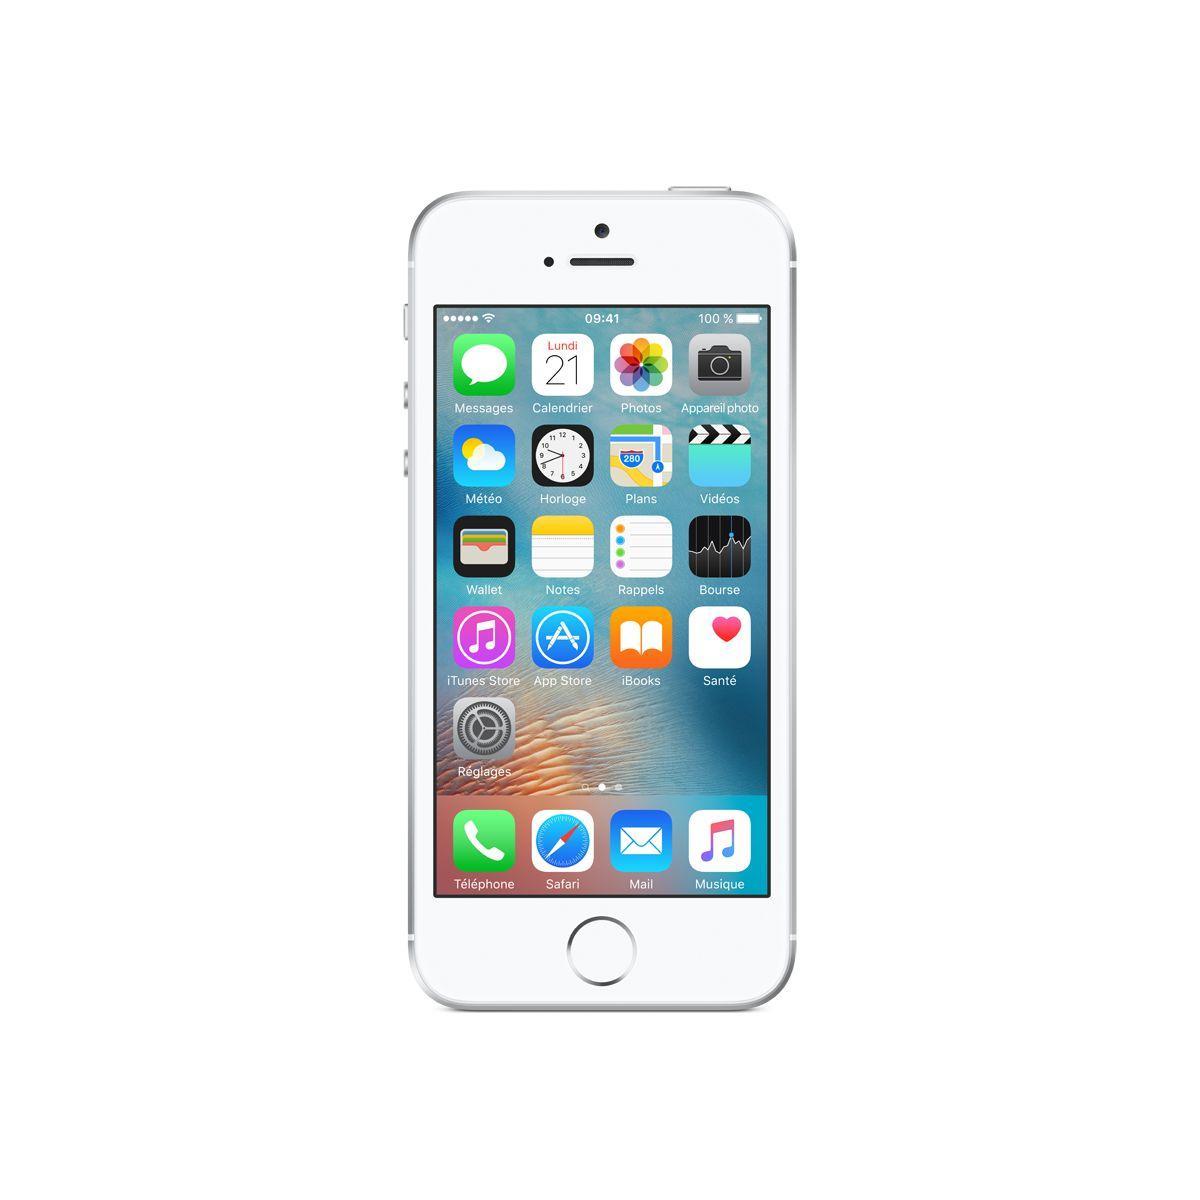 Smartphone apple iphone se 128go silver - livraison offerte : code livrelais